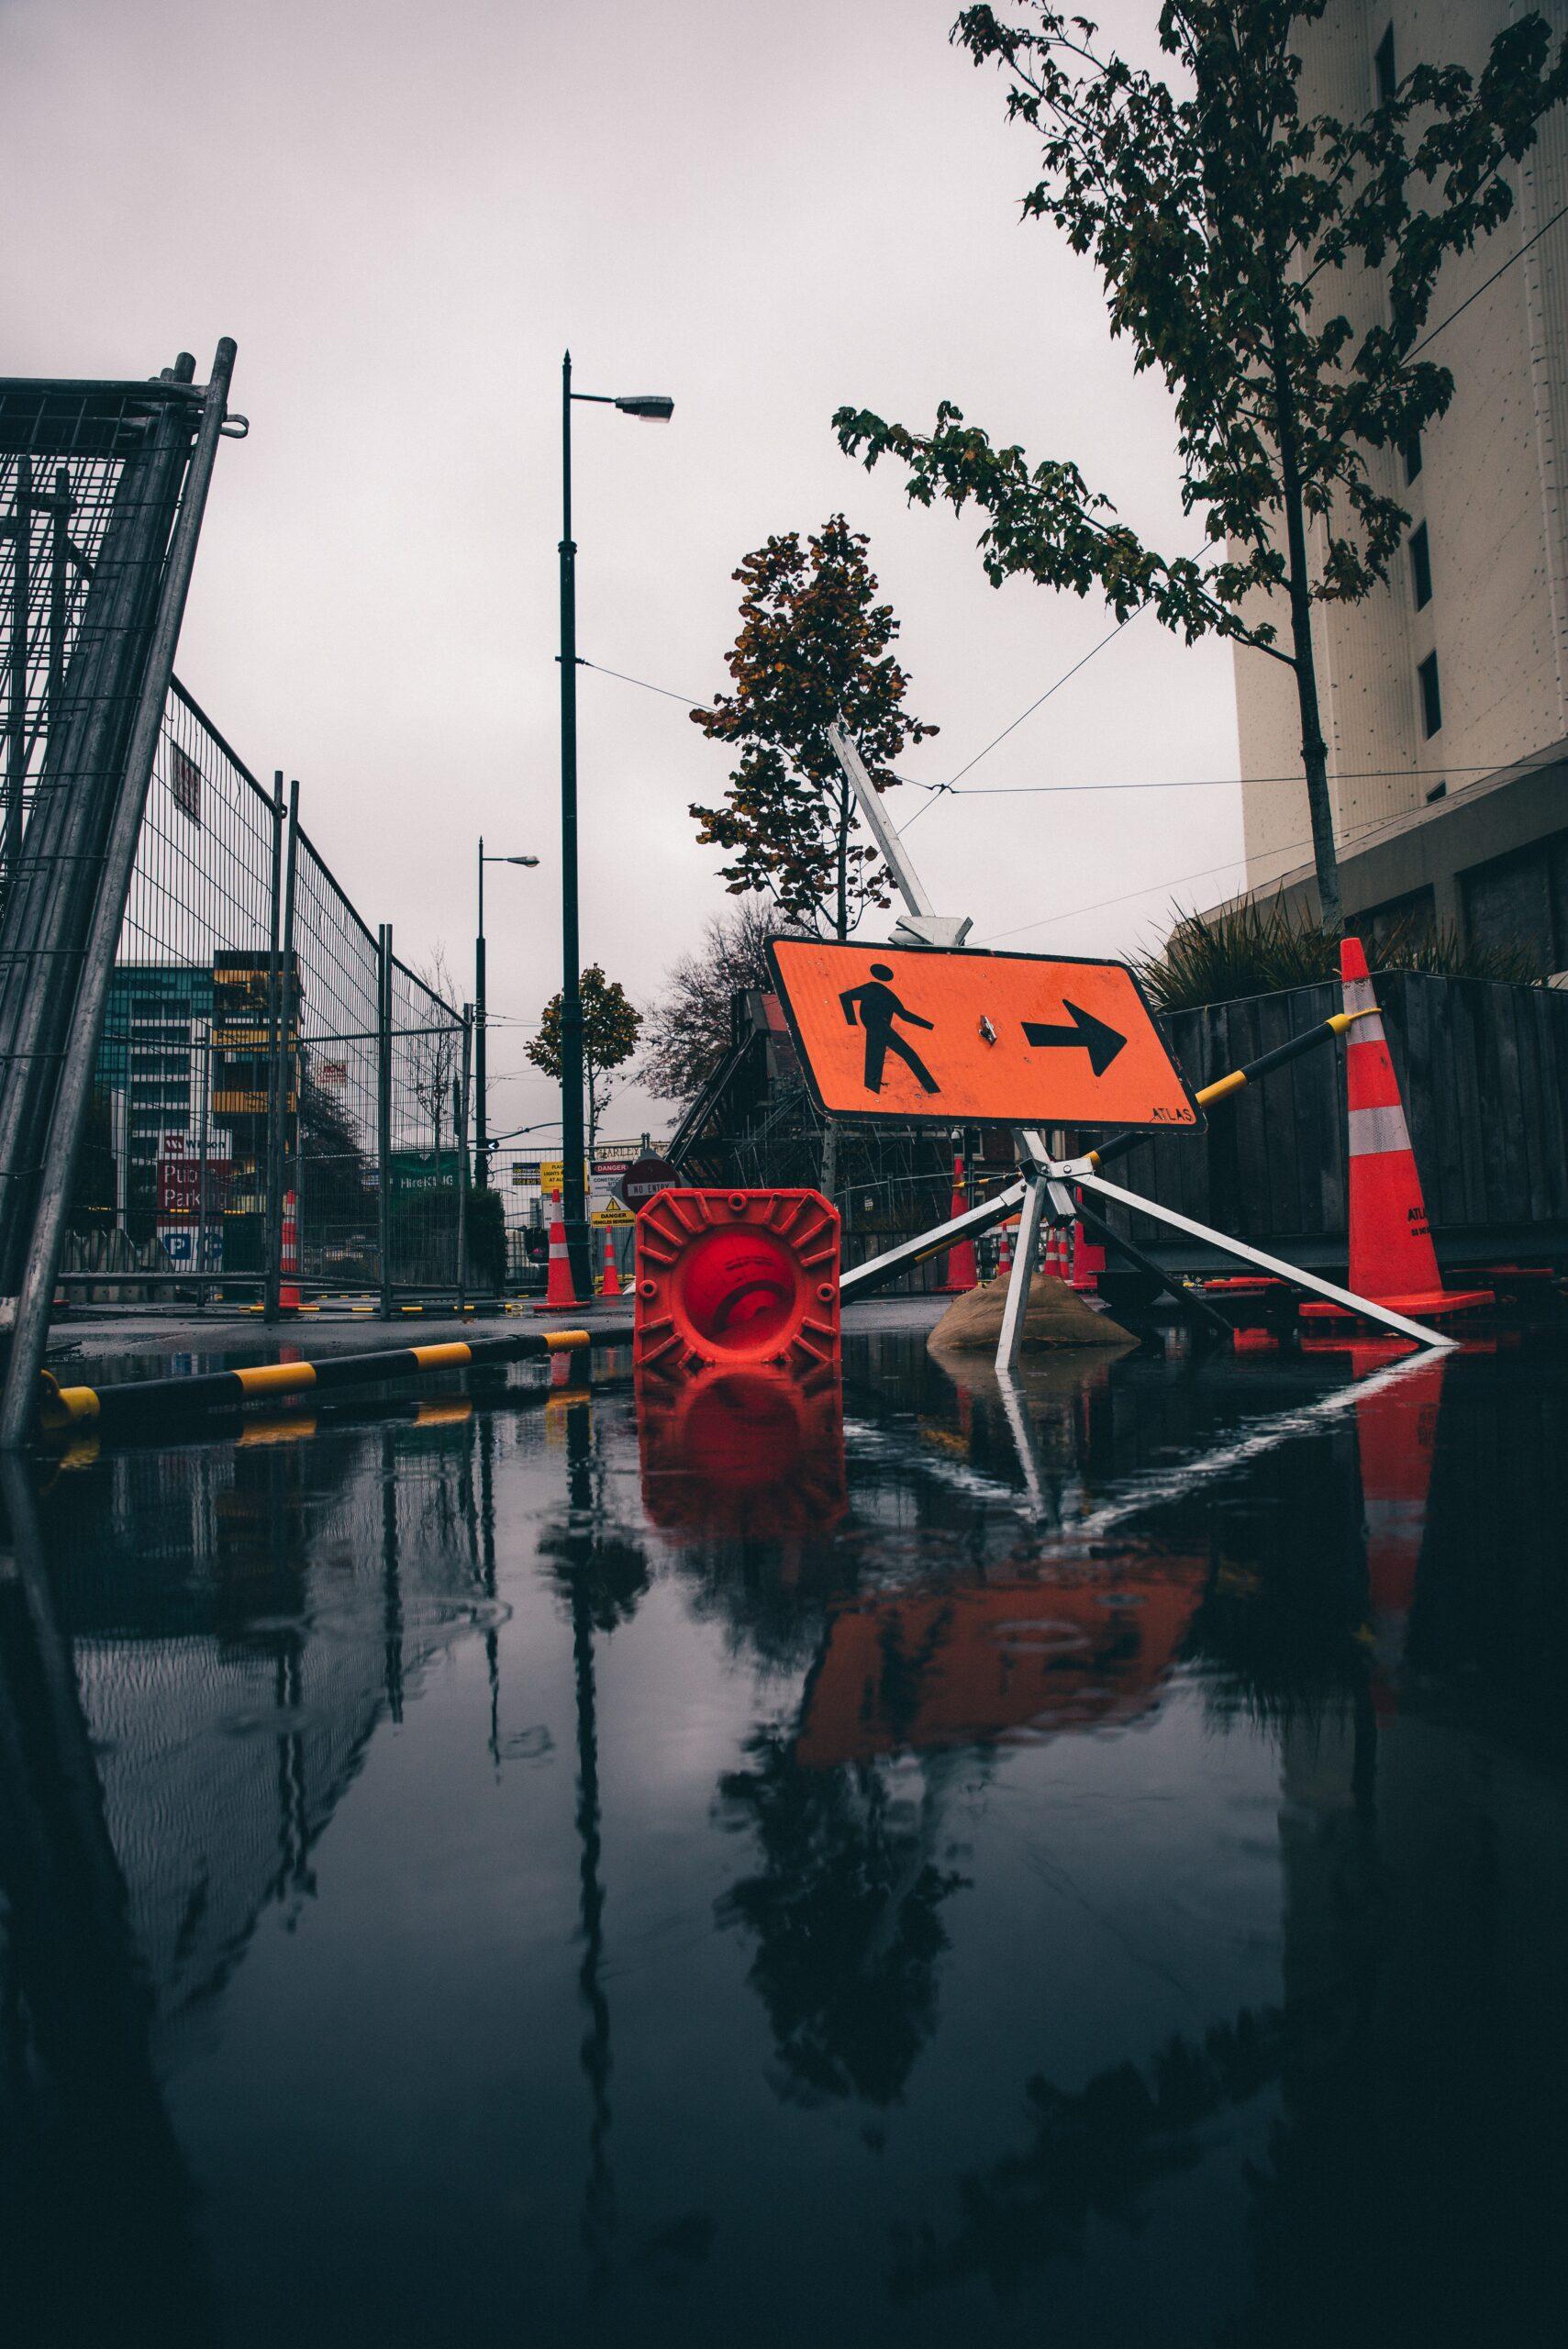 Water Main Break Shuts Down Street